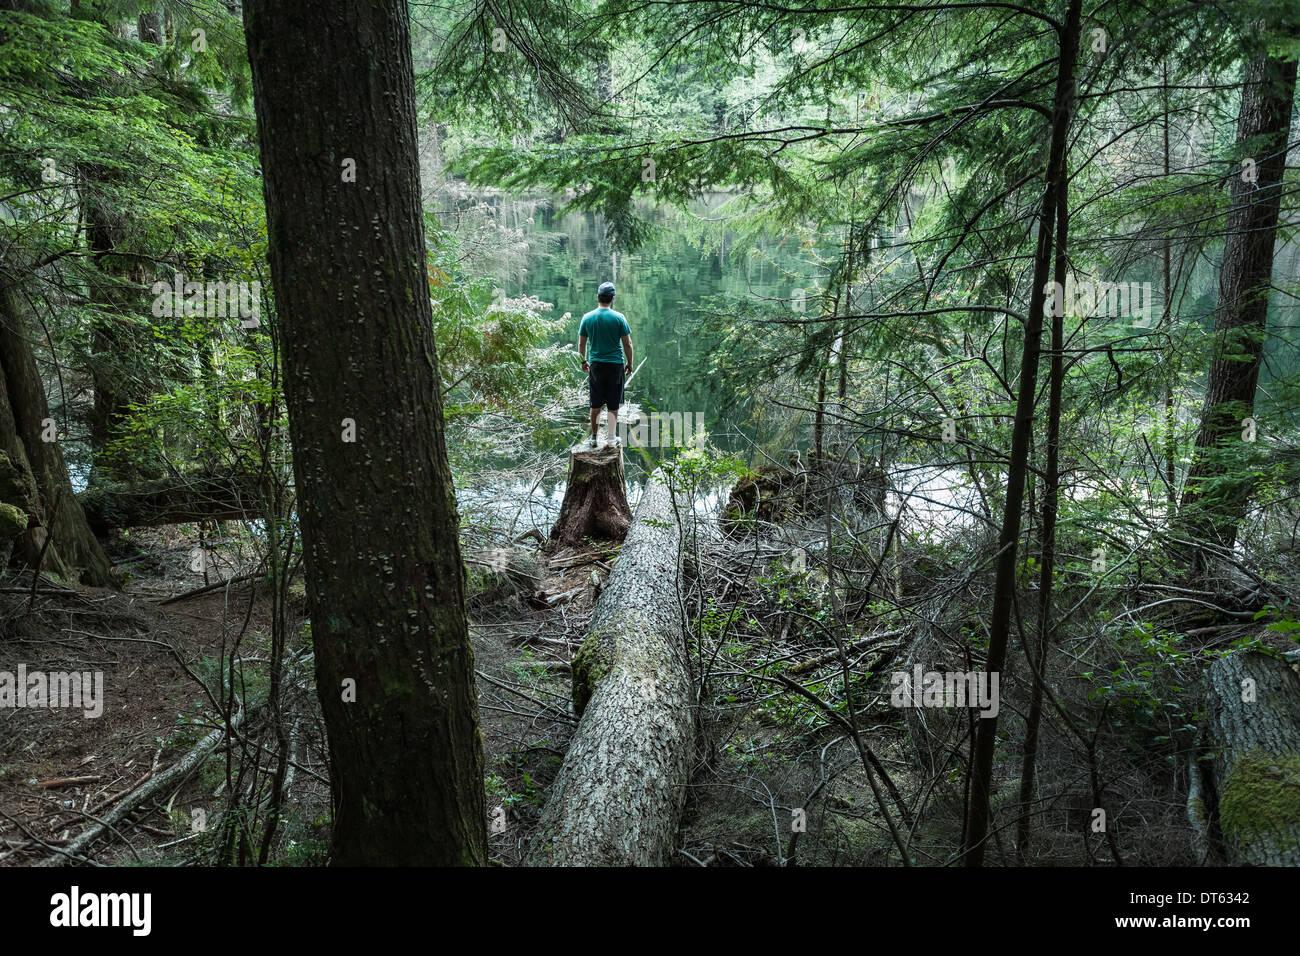 Mann im Wald, Buntzen Lake, British Columbia, Kanada Stockbild